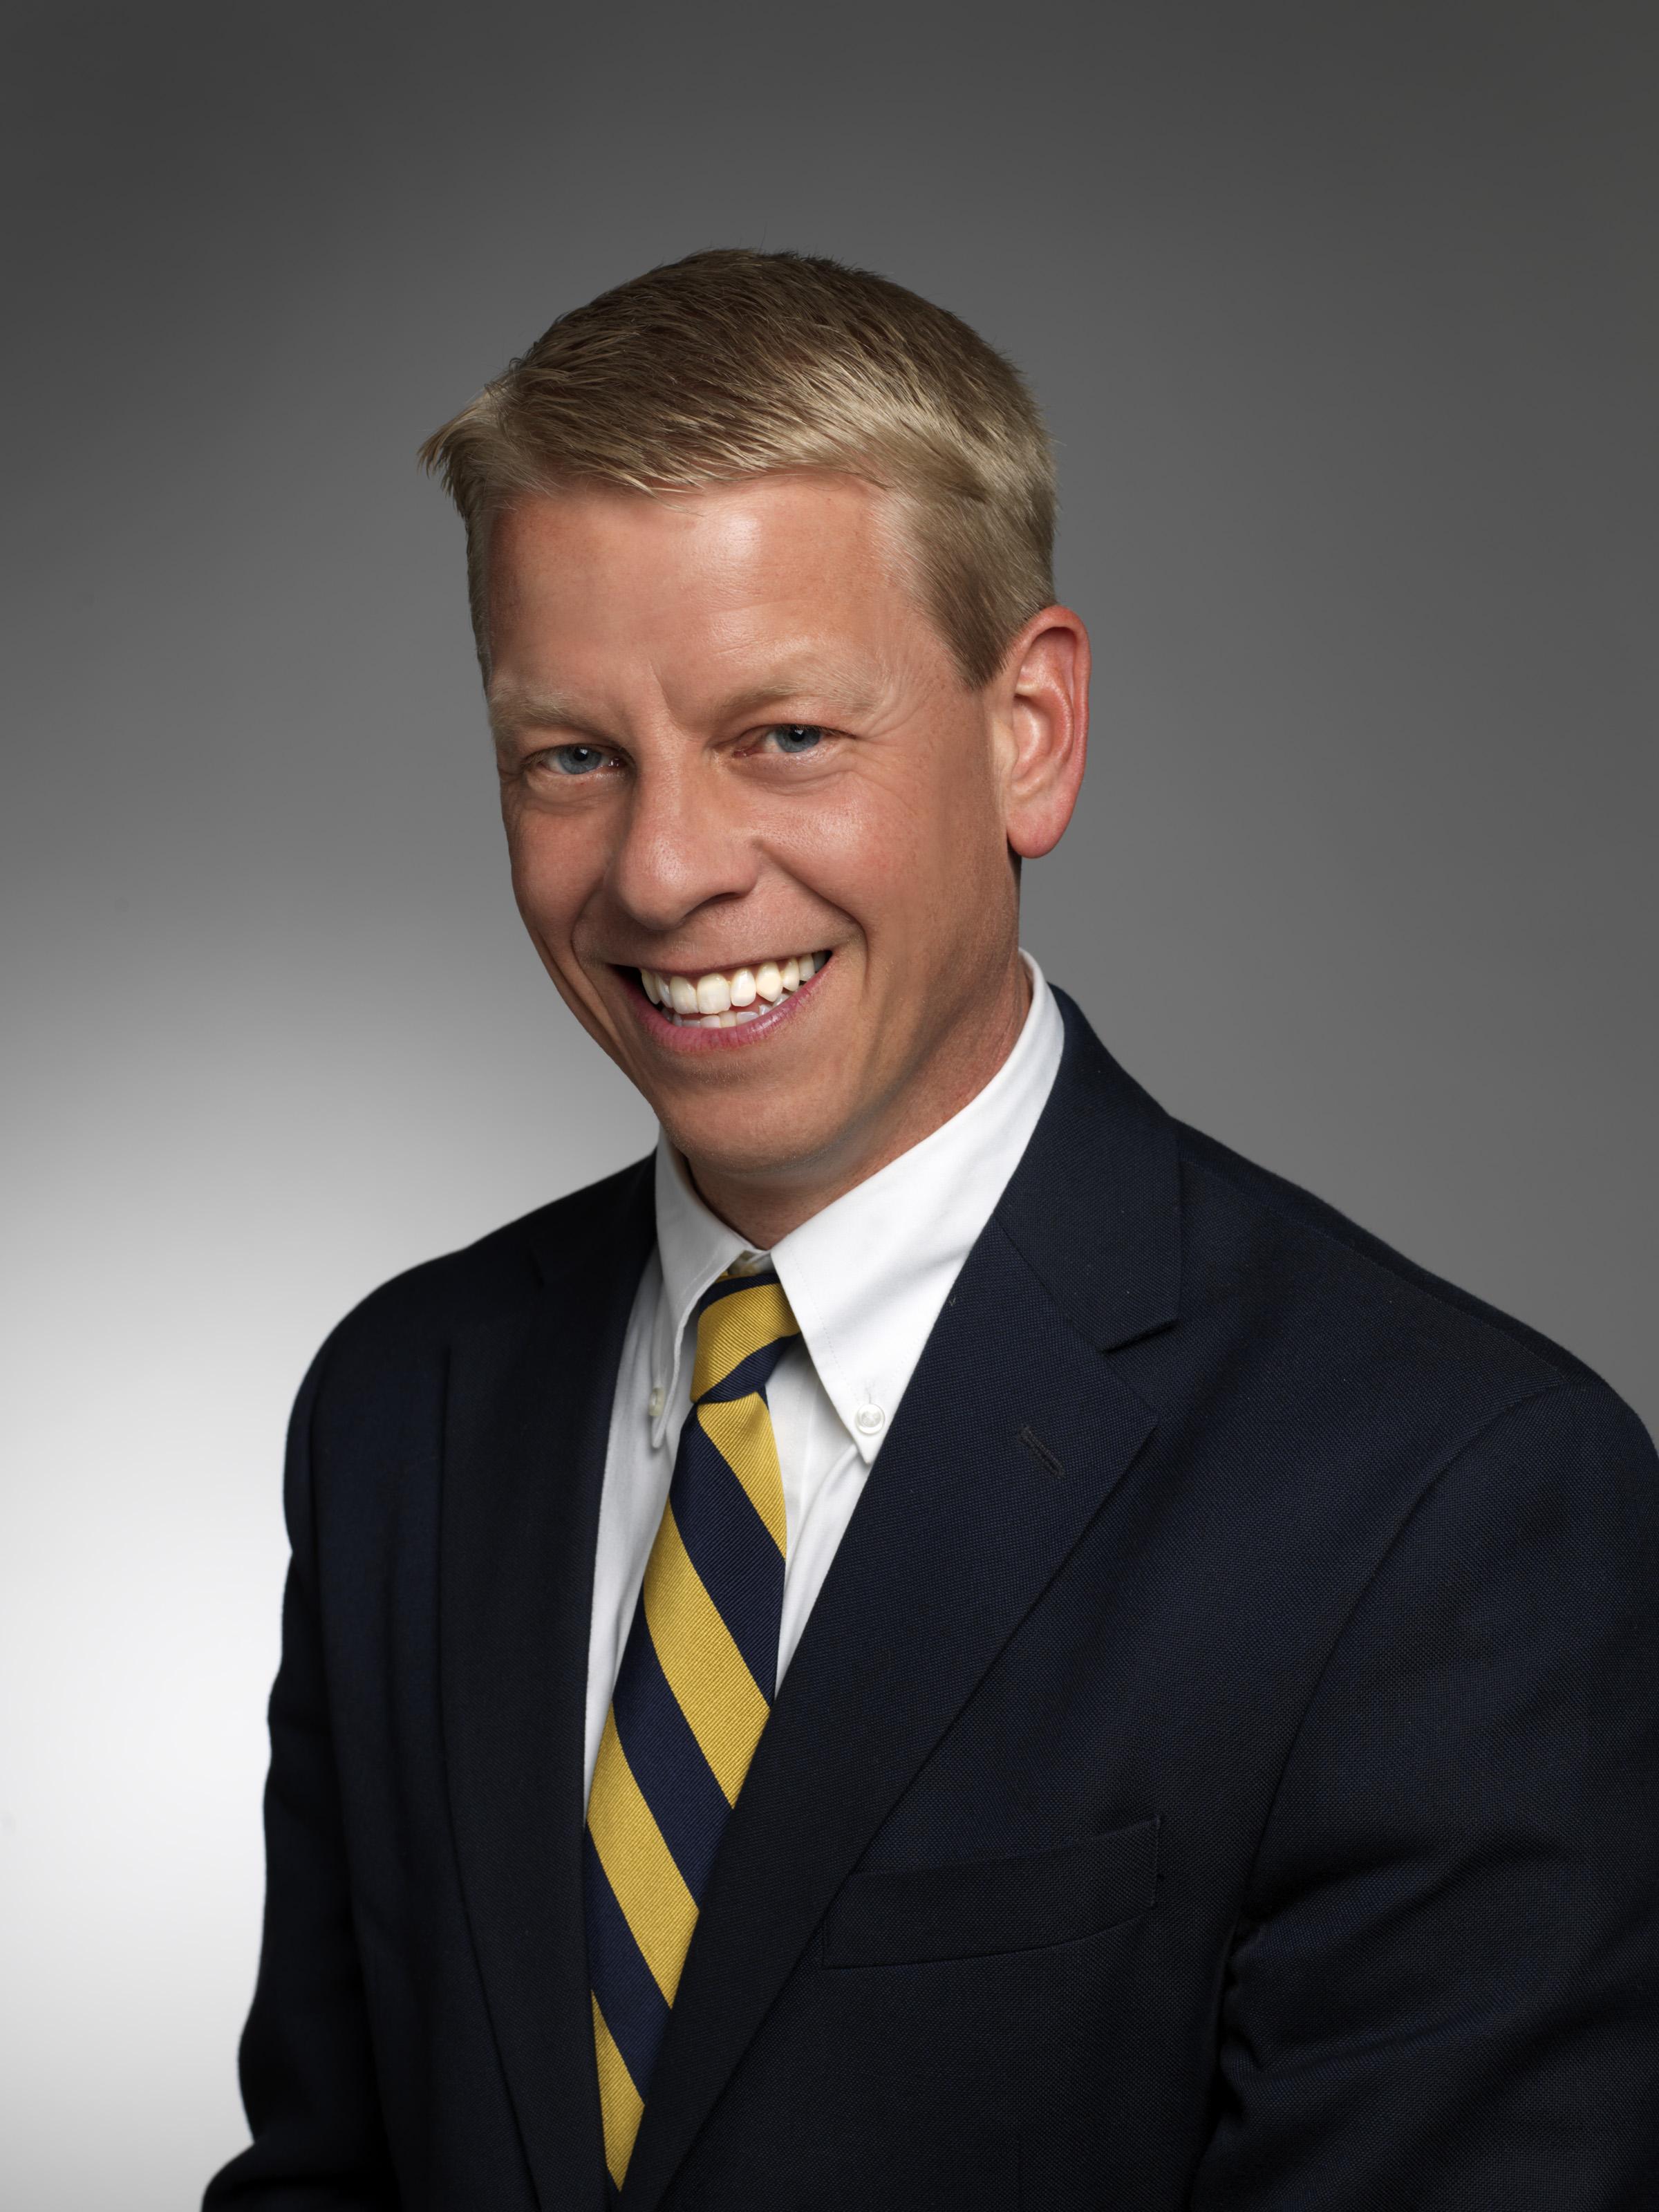 Dr Stephen J Nichols Named The New President Of